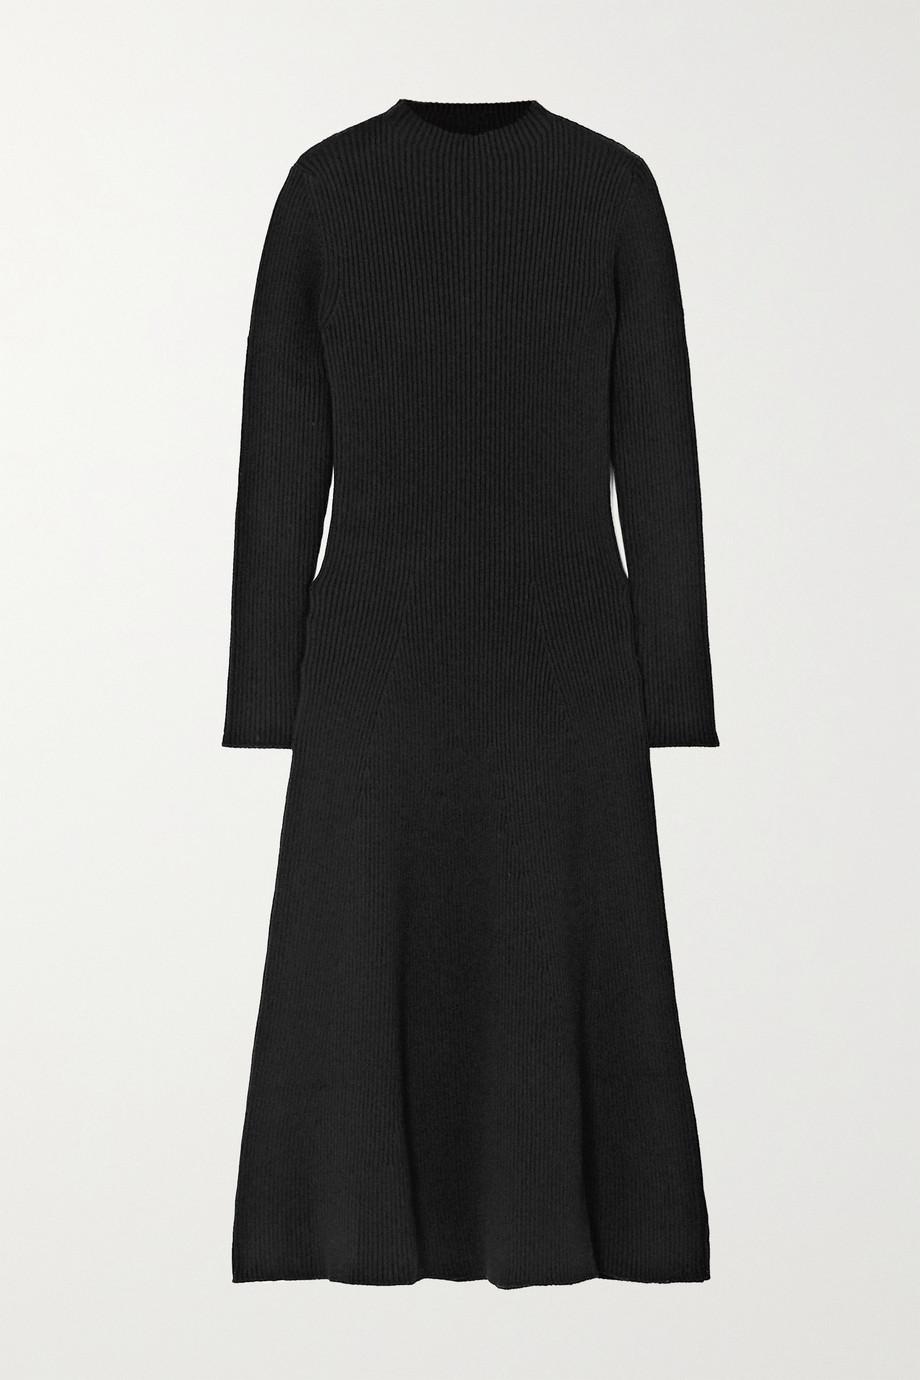 Prada Ribbed wool-blend midi dress